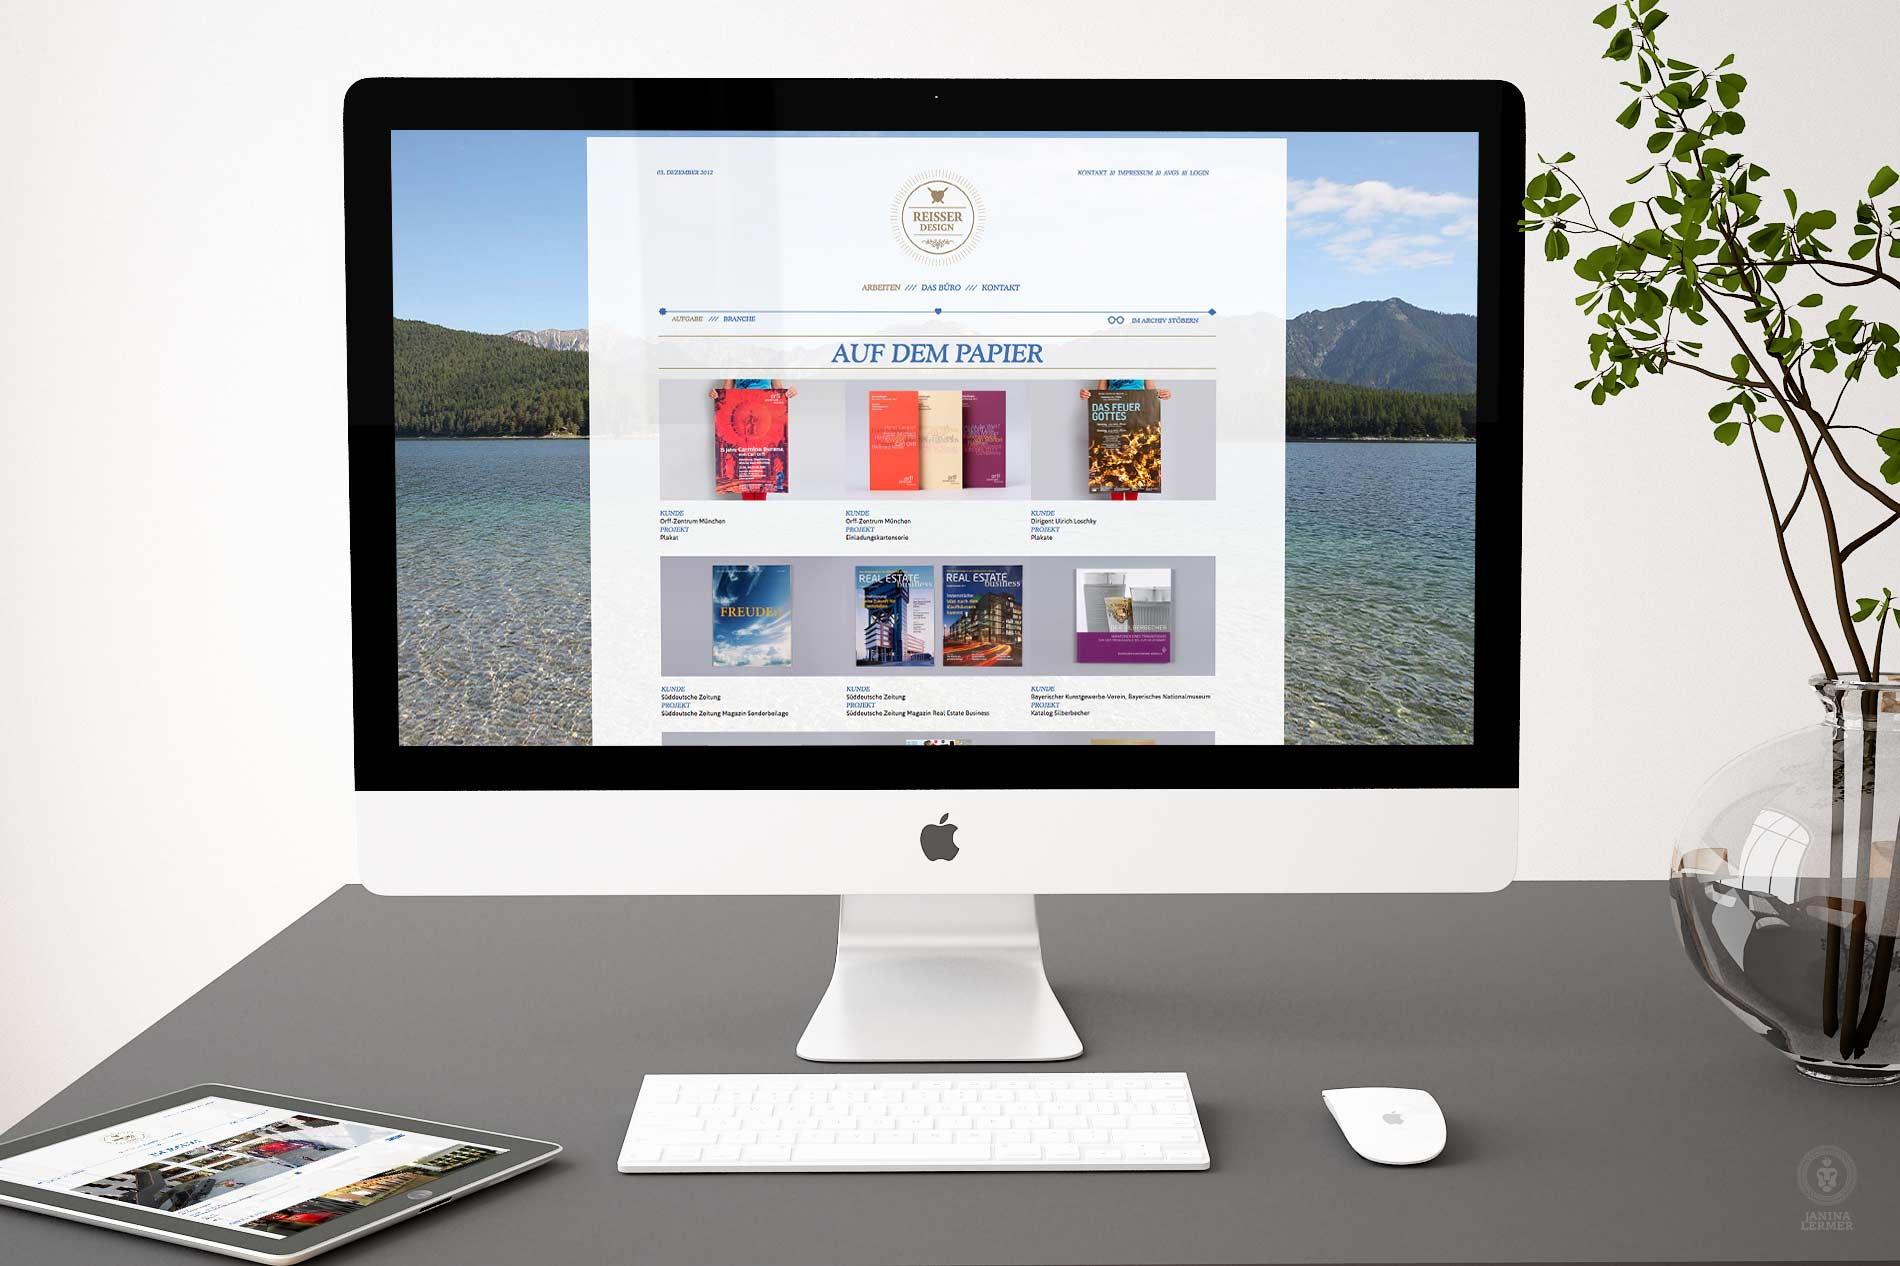 Janina-Lermer-Webseitenkonzept-Webseitengestaltung-Webdesign-Reisserdesign-Projekte-Projects-Papier-Paper